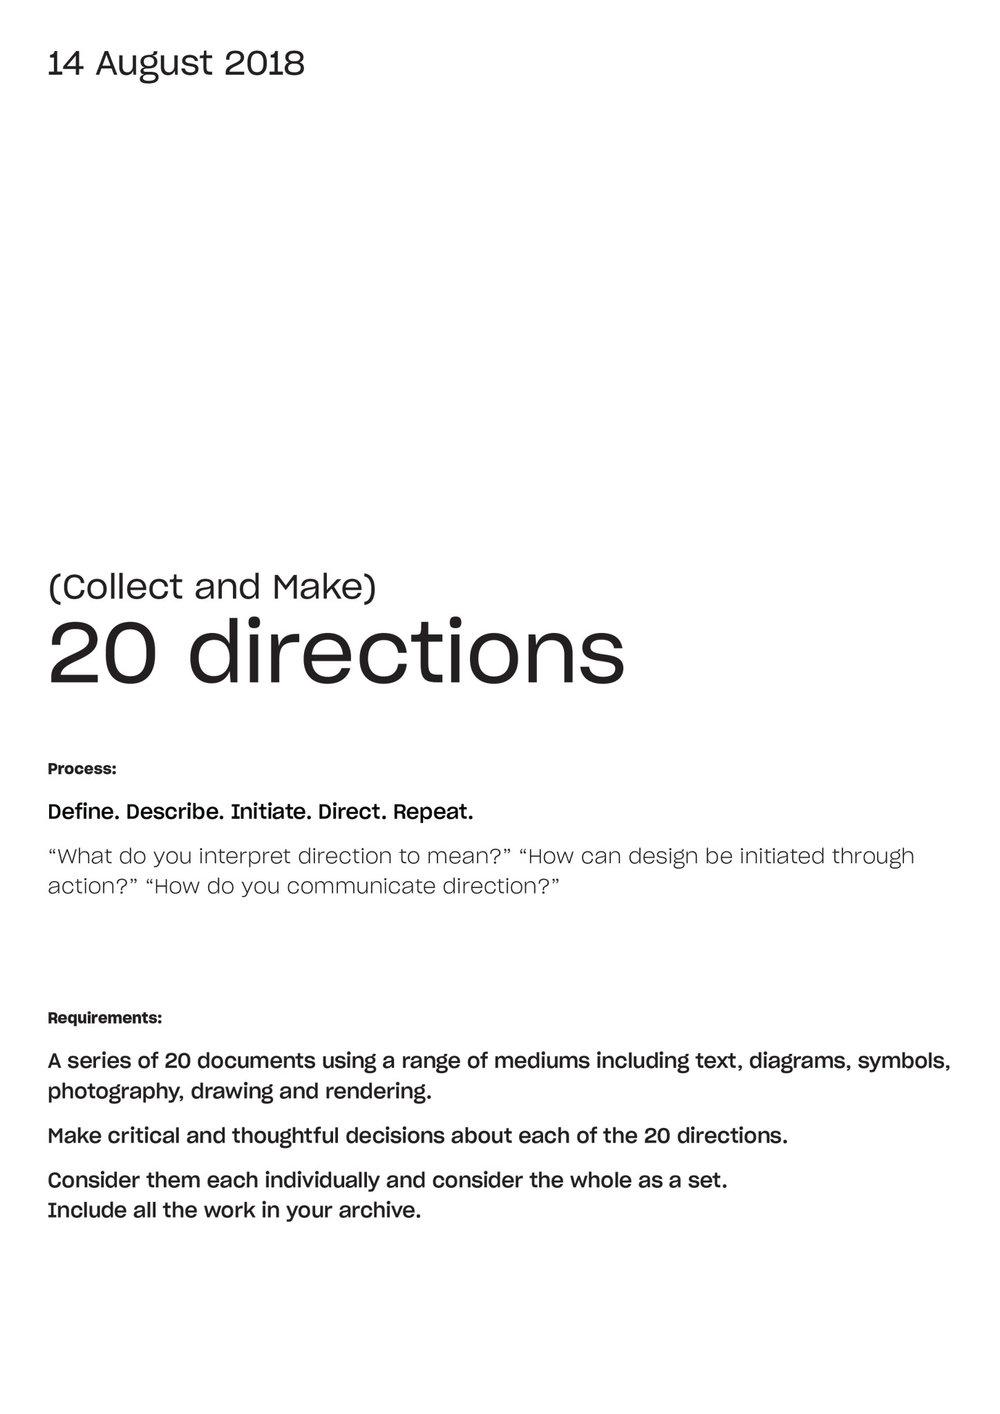 20-directions.jpg